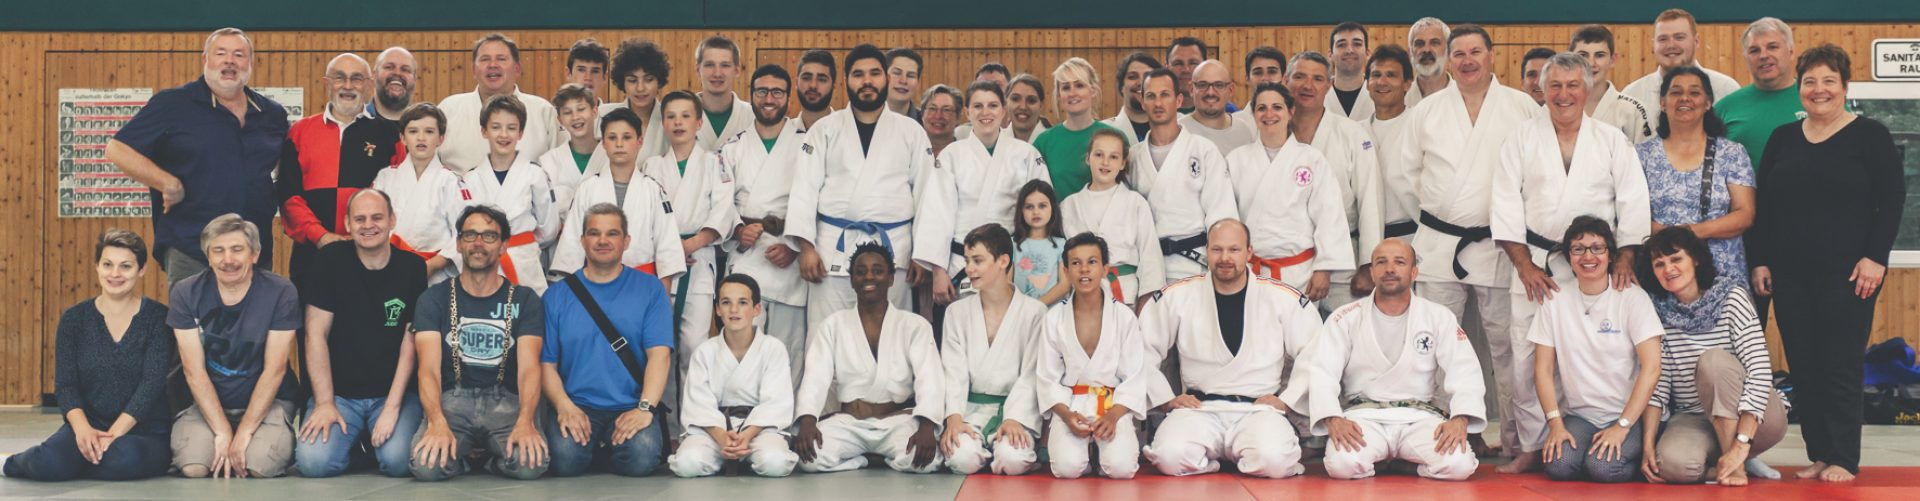 VfL Gevelsberg Judo e.V.